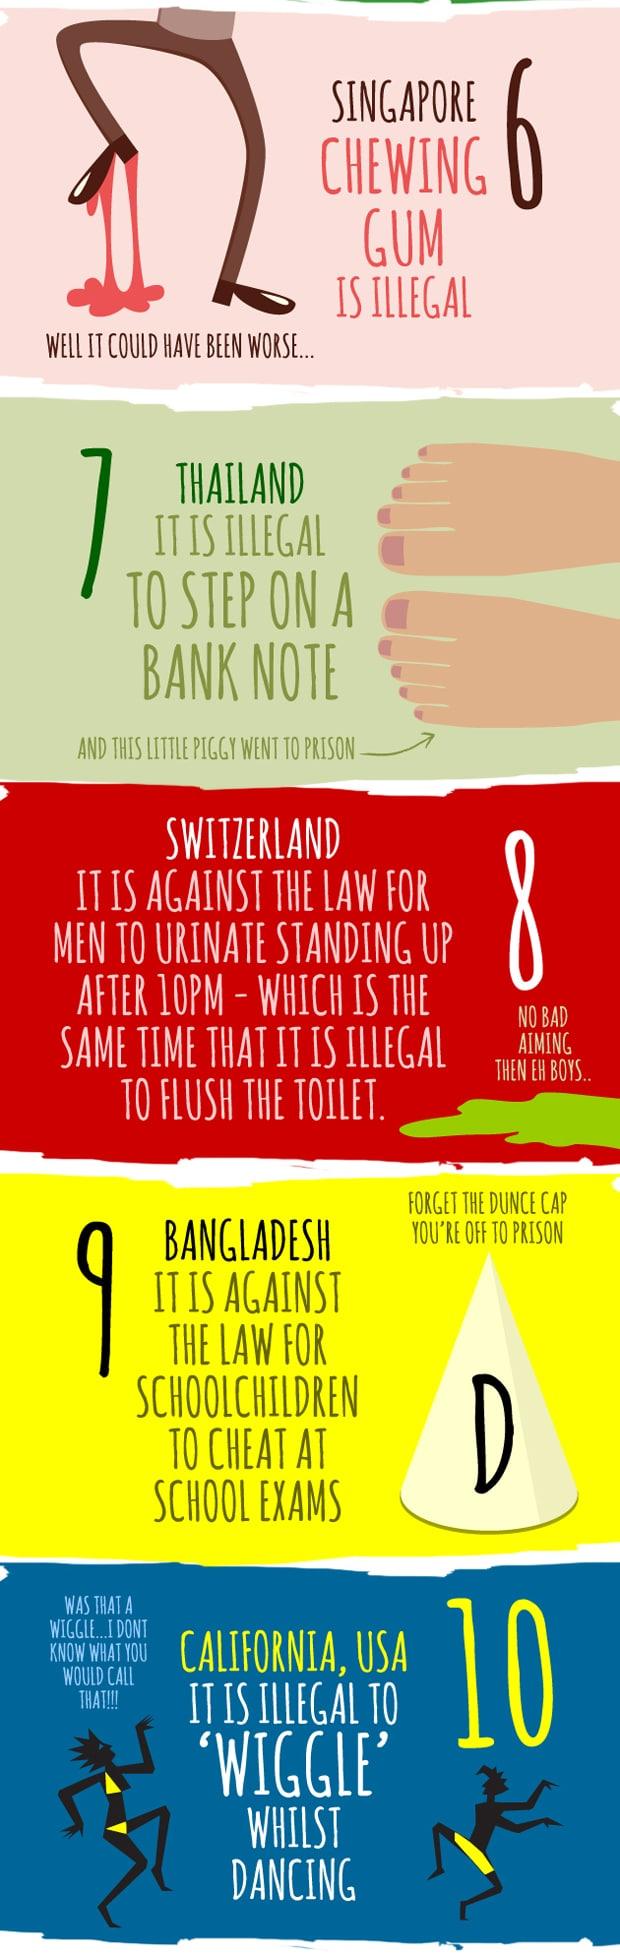 The strangest laws around the world